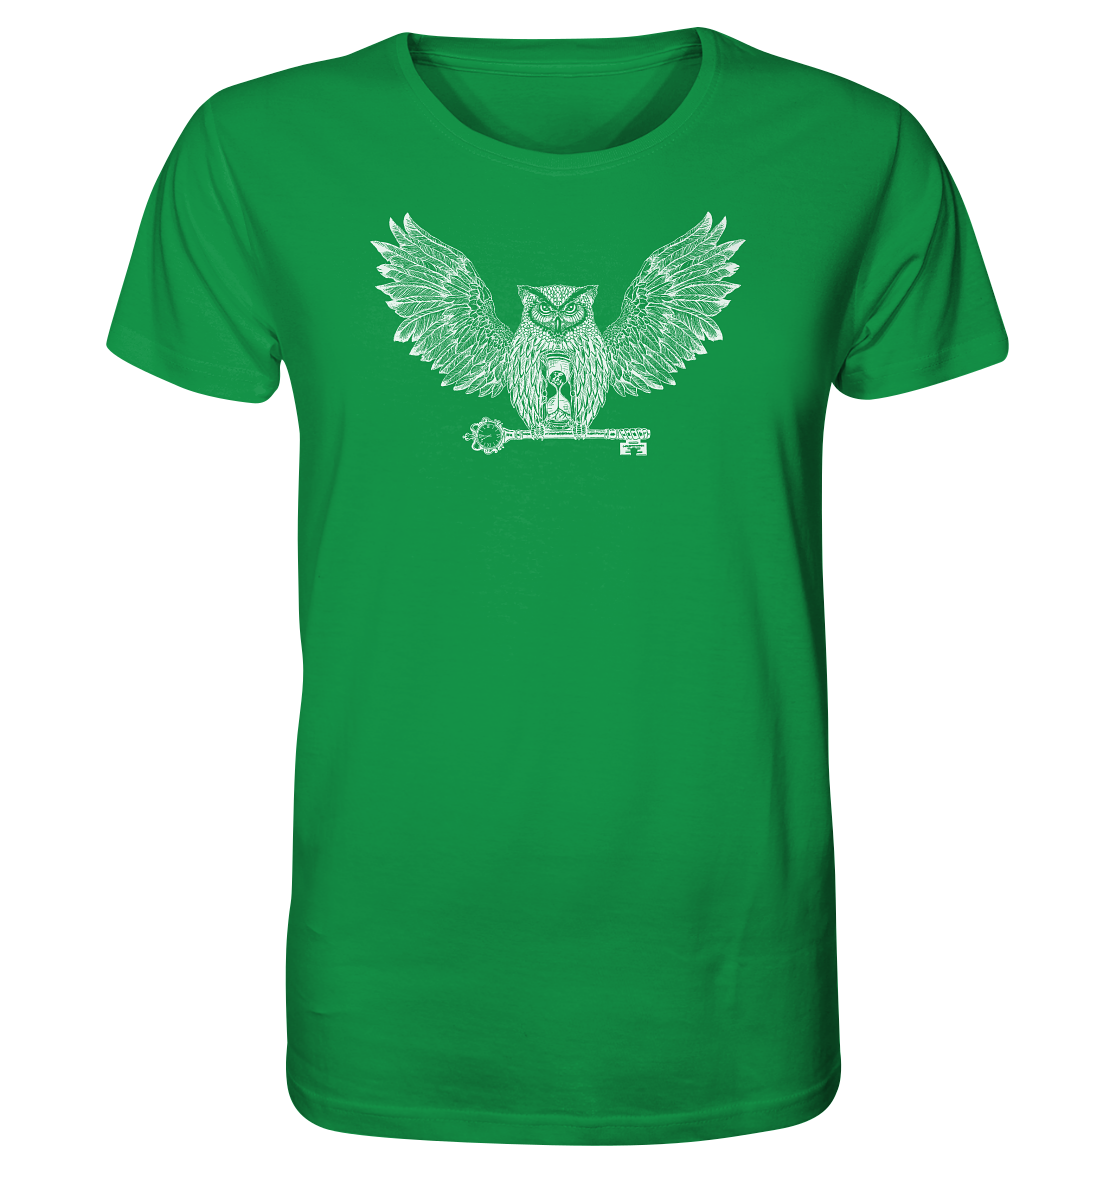 front-organic-shirt-149348-1116x-9.png